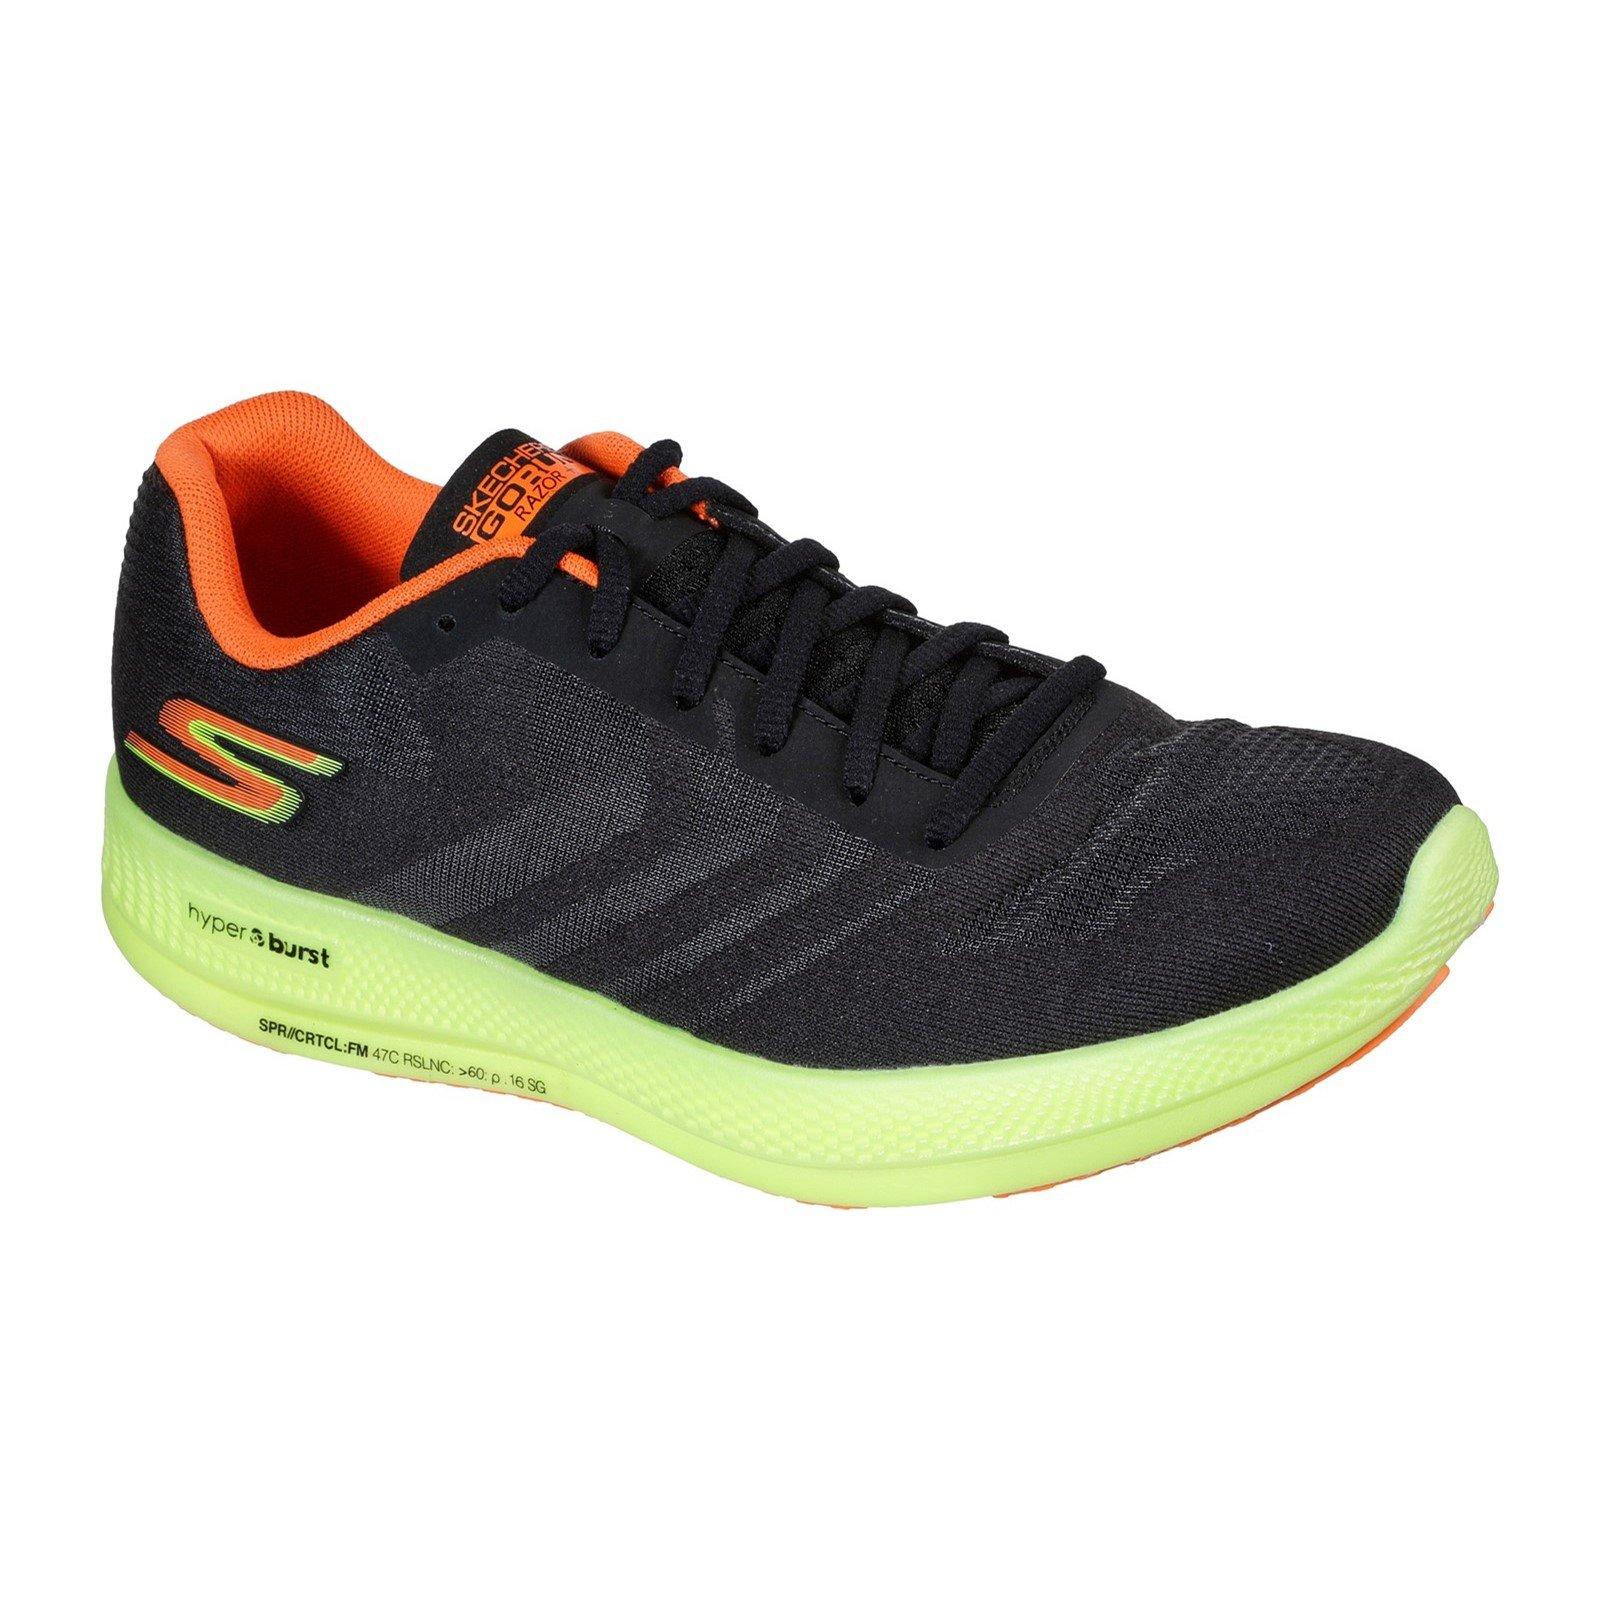 Skechers Women's Go Run Razor Trainer Various Colours 32703 - Black/Yellow/Orange 6